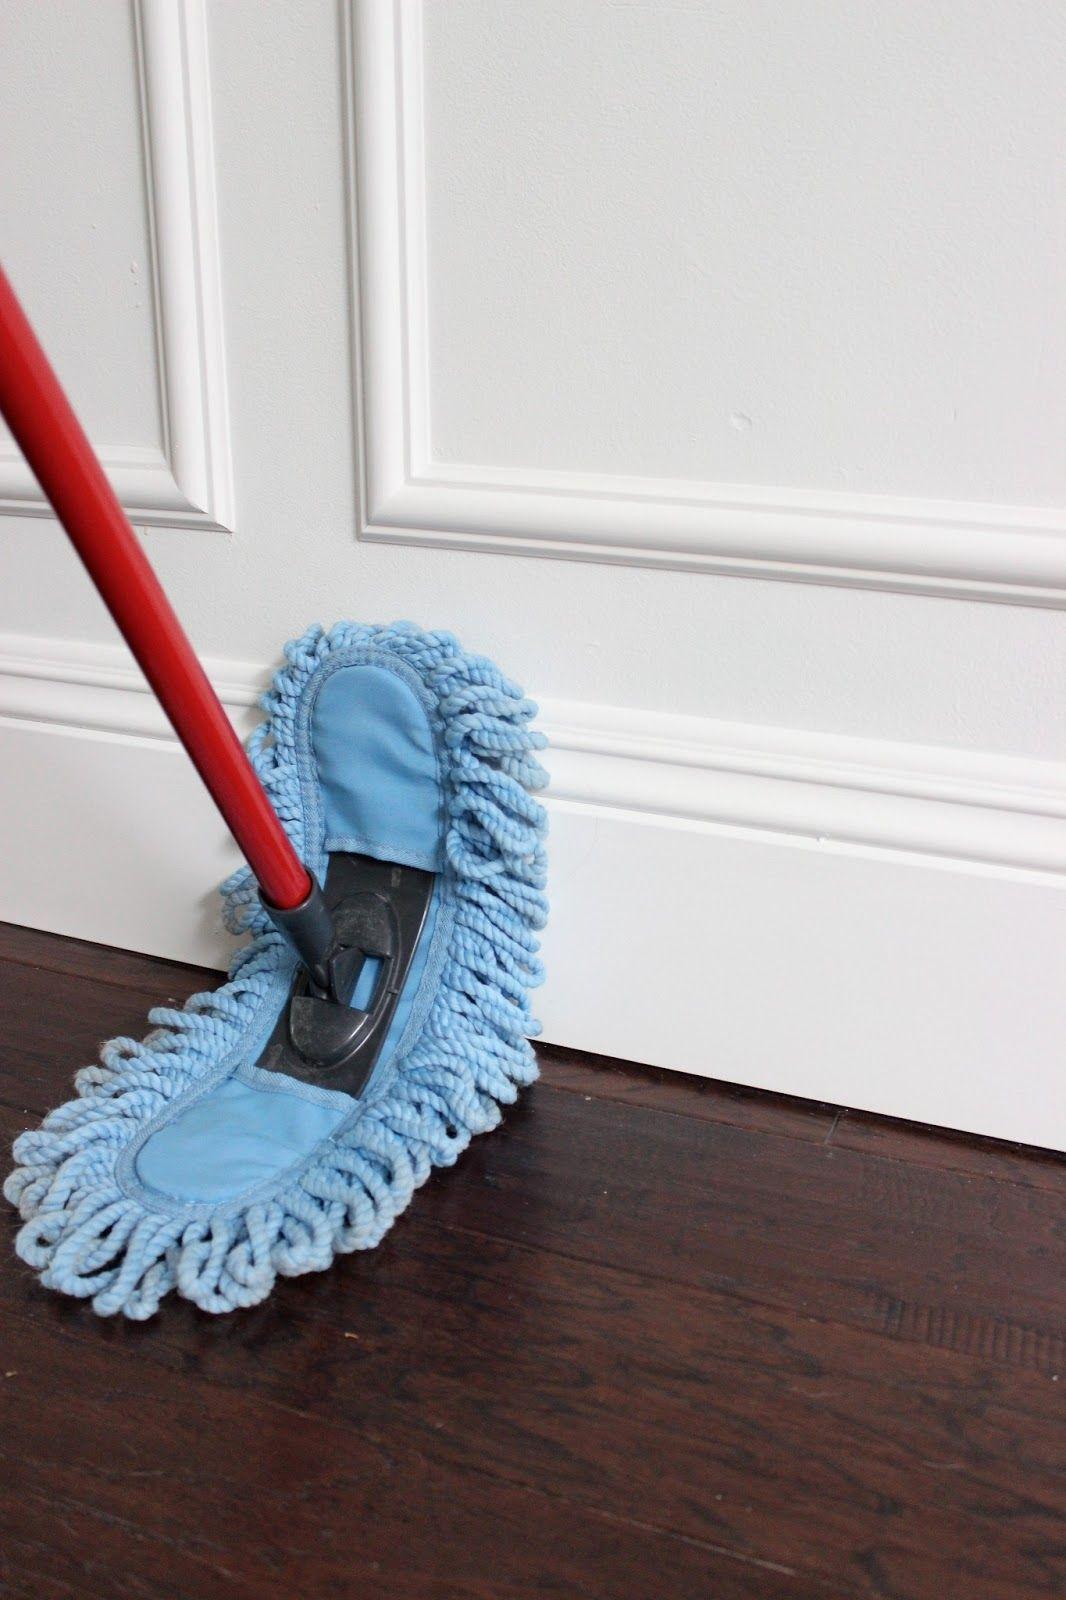 Best Mop To Use On Laminate Wood Floors Clean hardwood